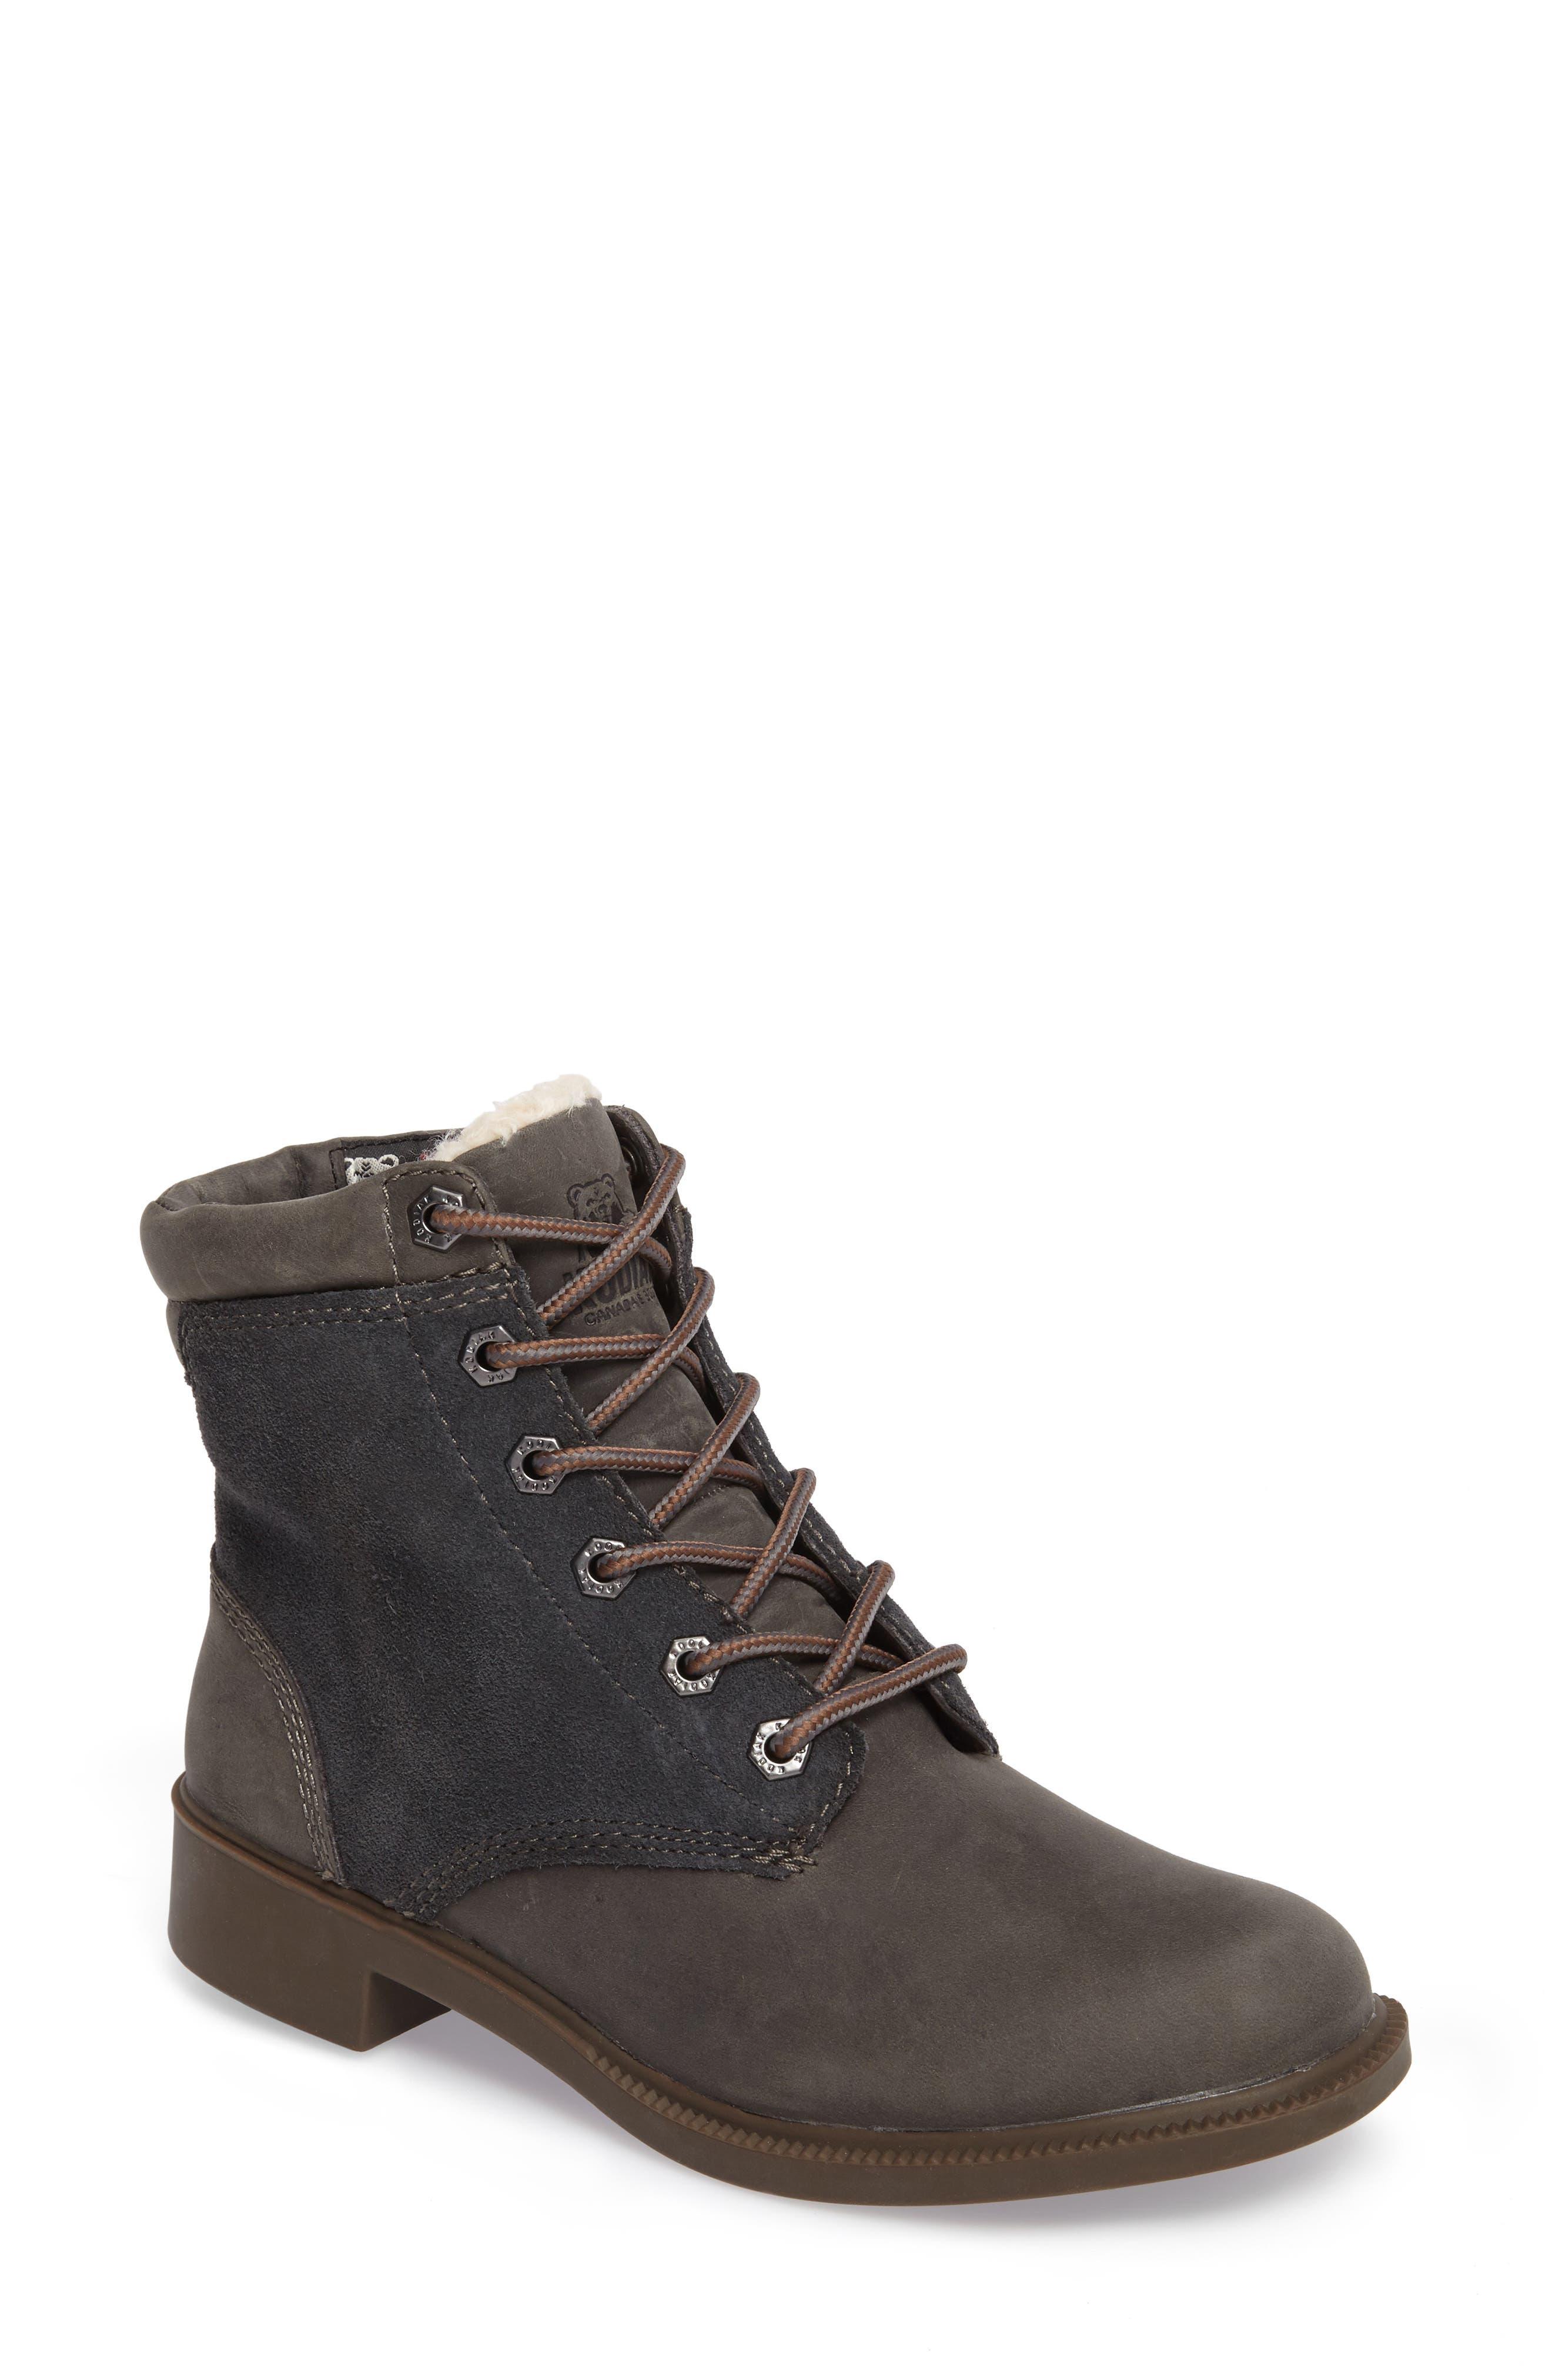 Main Image - Kodiak Original Waterproof Fleece Boot (Women)